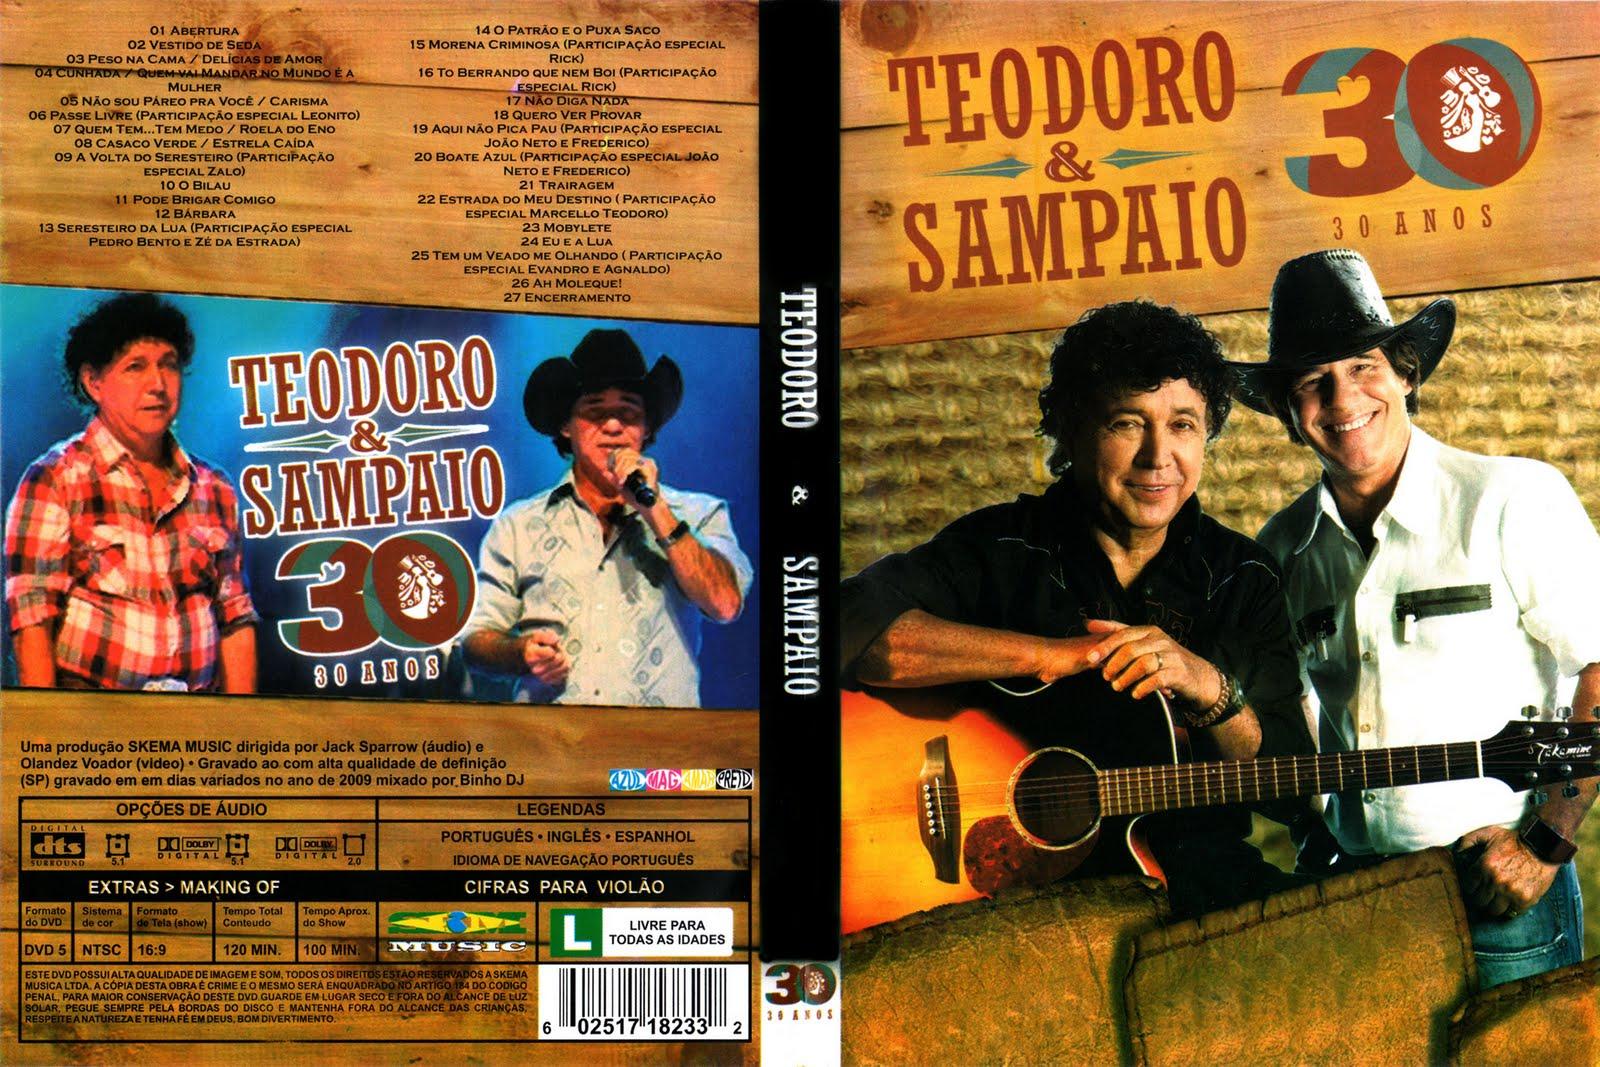 Teodoro e Sampaio 30 Anos Ao Vivo DVDRip XviD (2011) Teodoro  2526 Sampaio   30 Anos